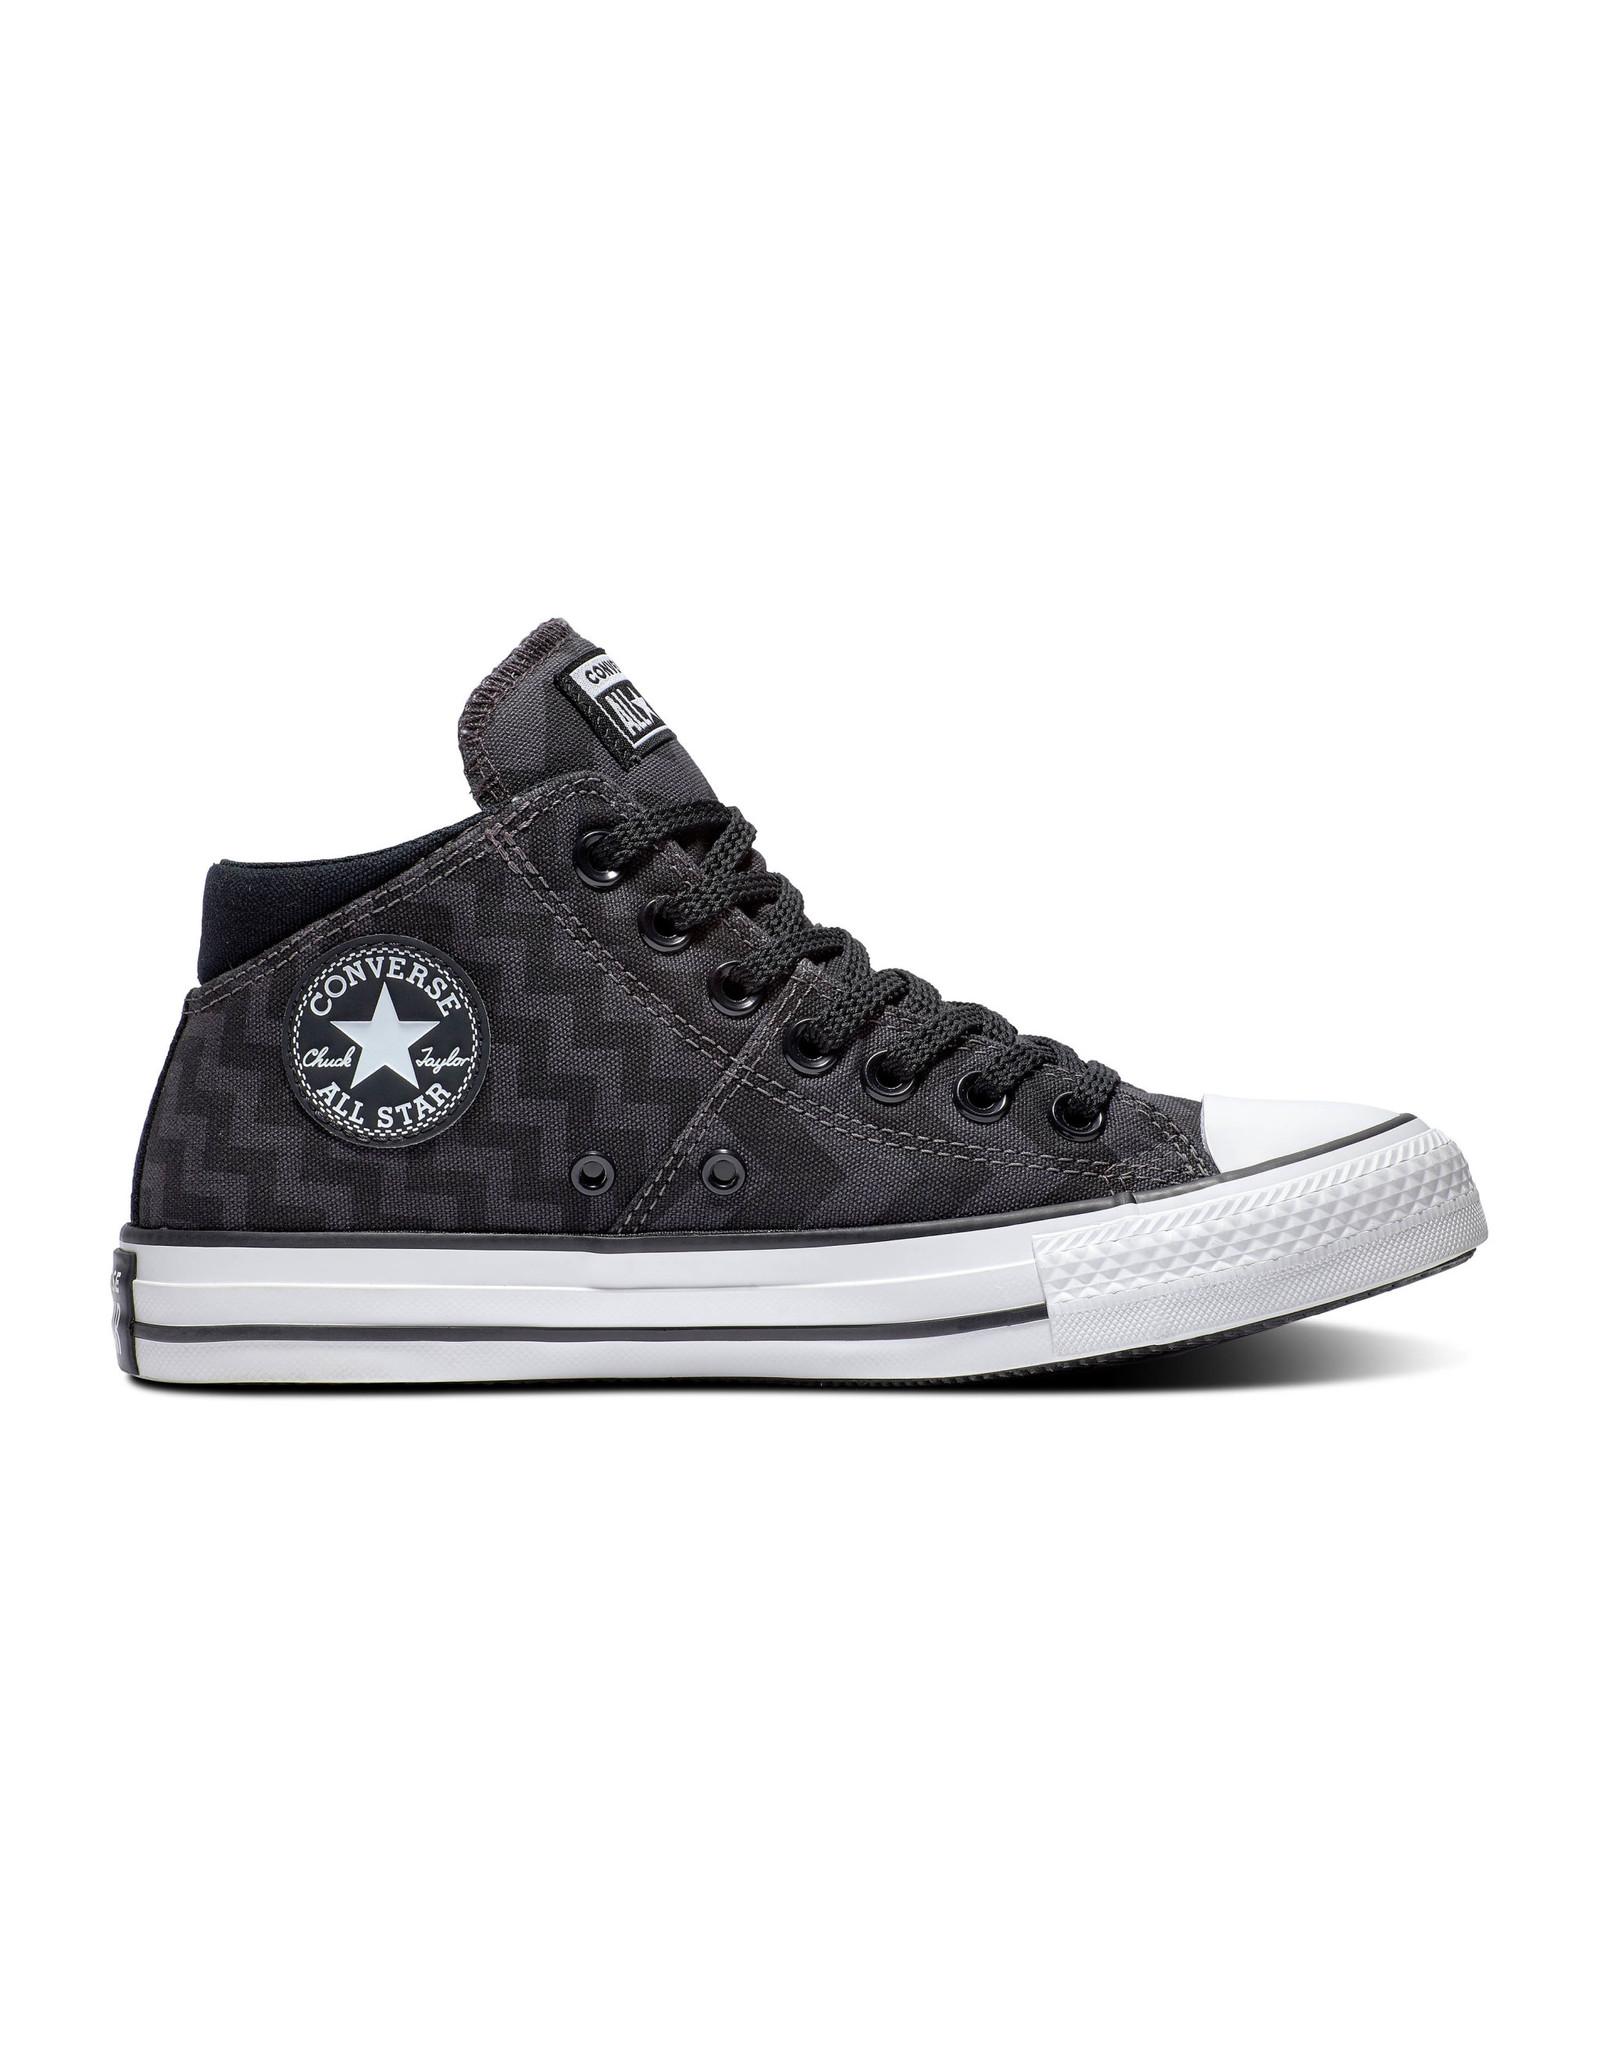 CONVERSE CHUCK TAYLOR ALL STAR MADISON MID BLACK/WHITE/BLACK C13MMS-565387C